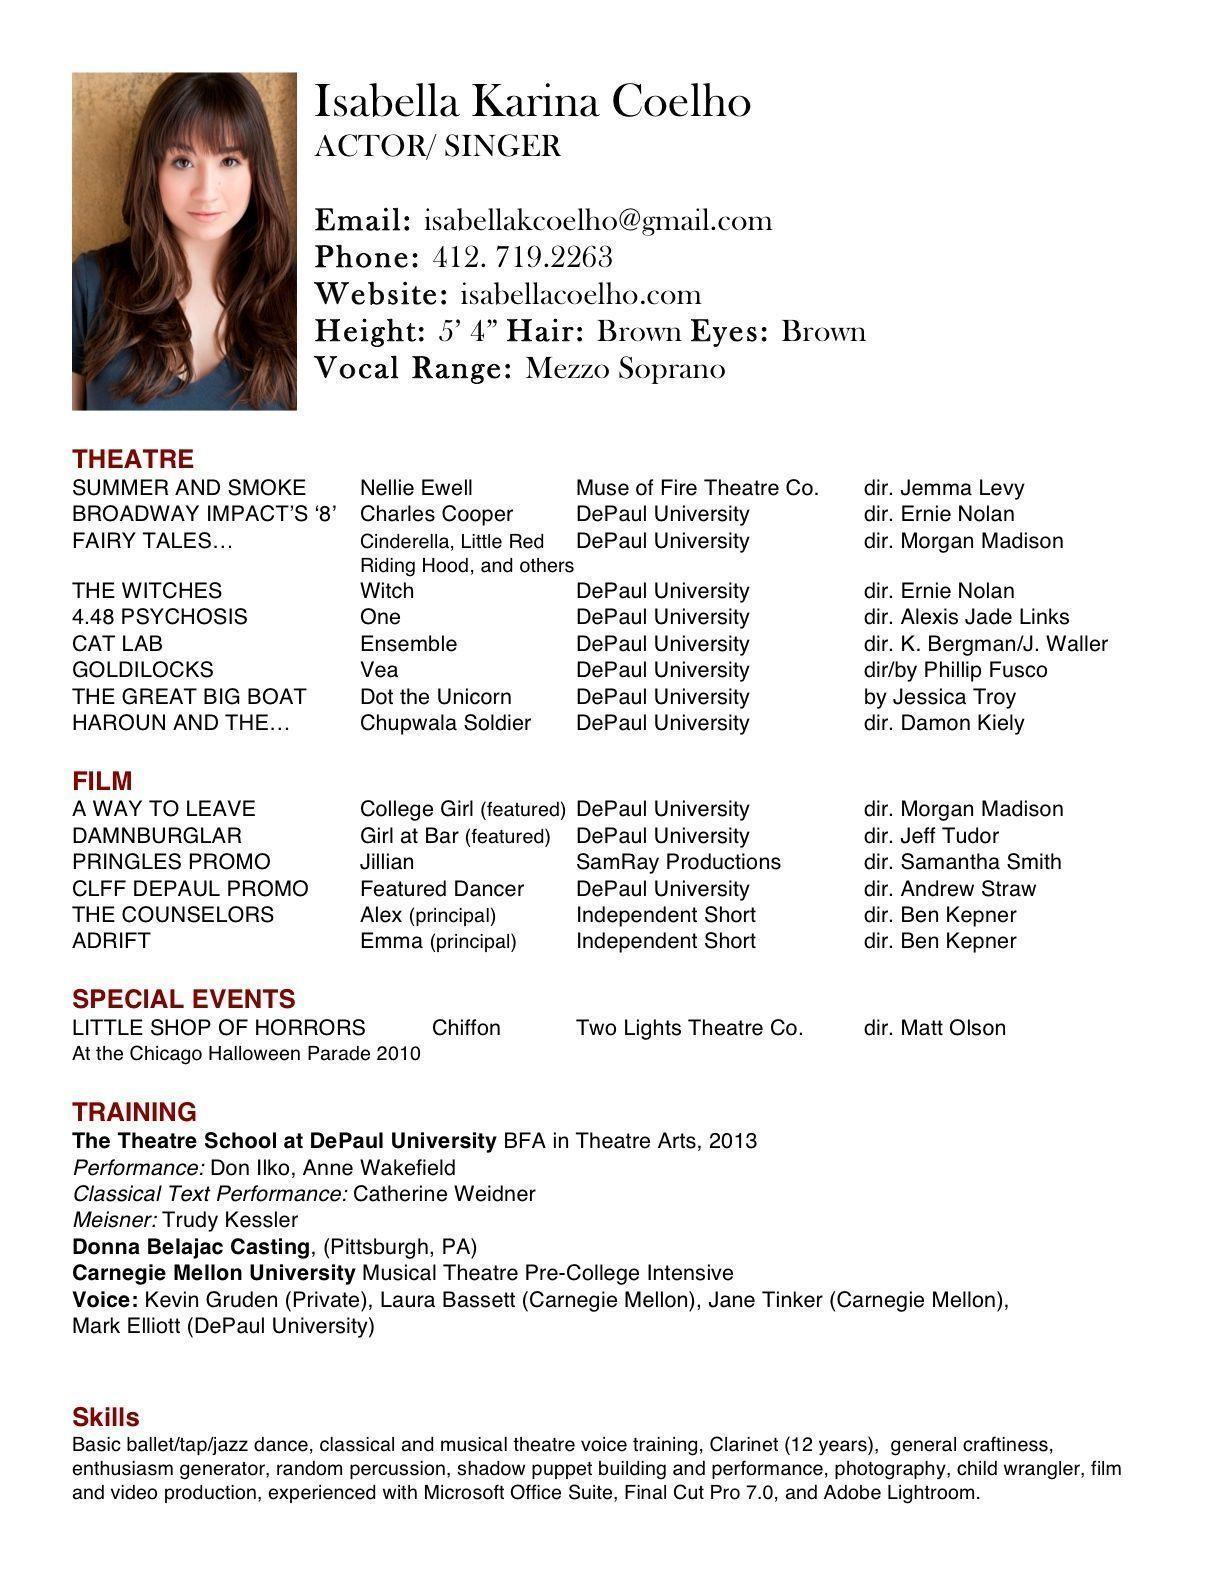 25 Beginner Actor Resume Template In 2020 Acting Resume Template